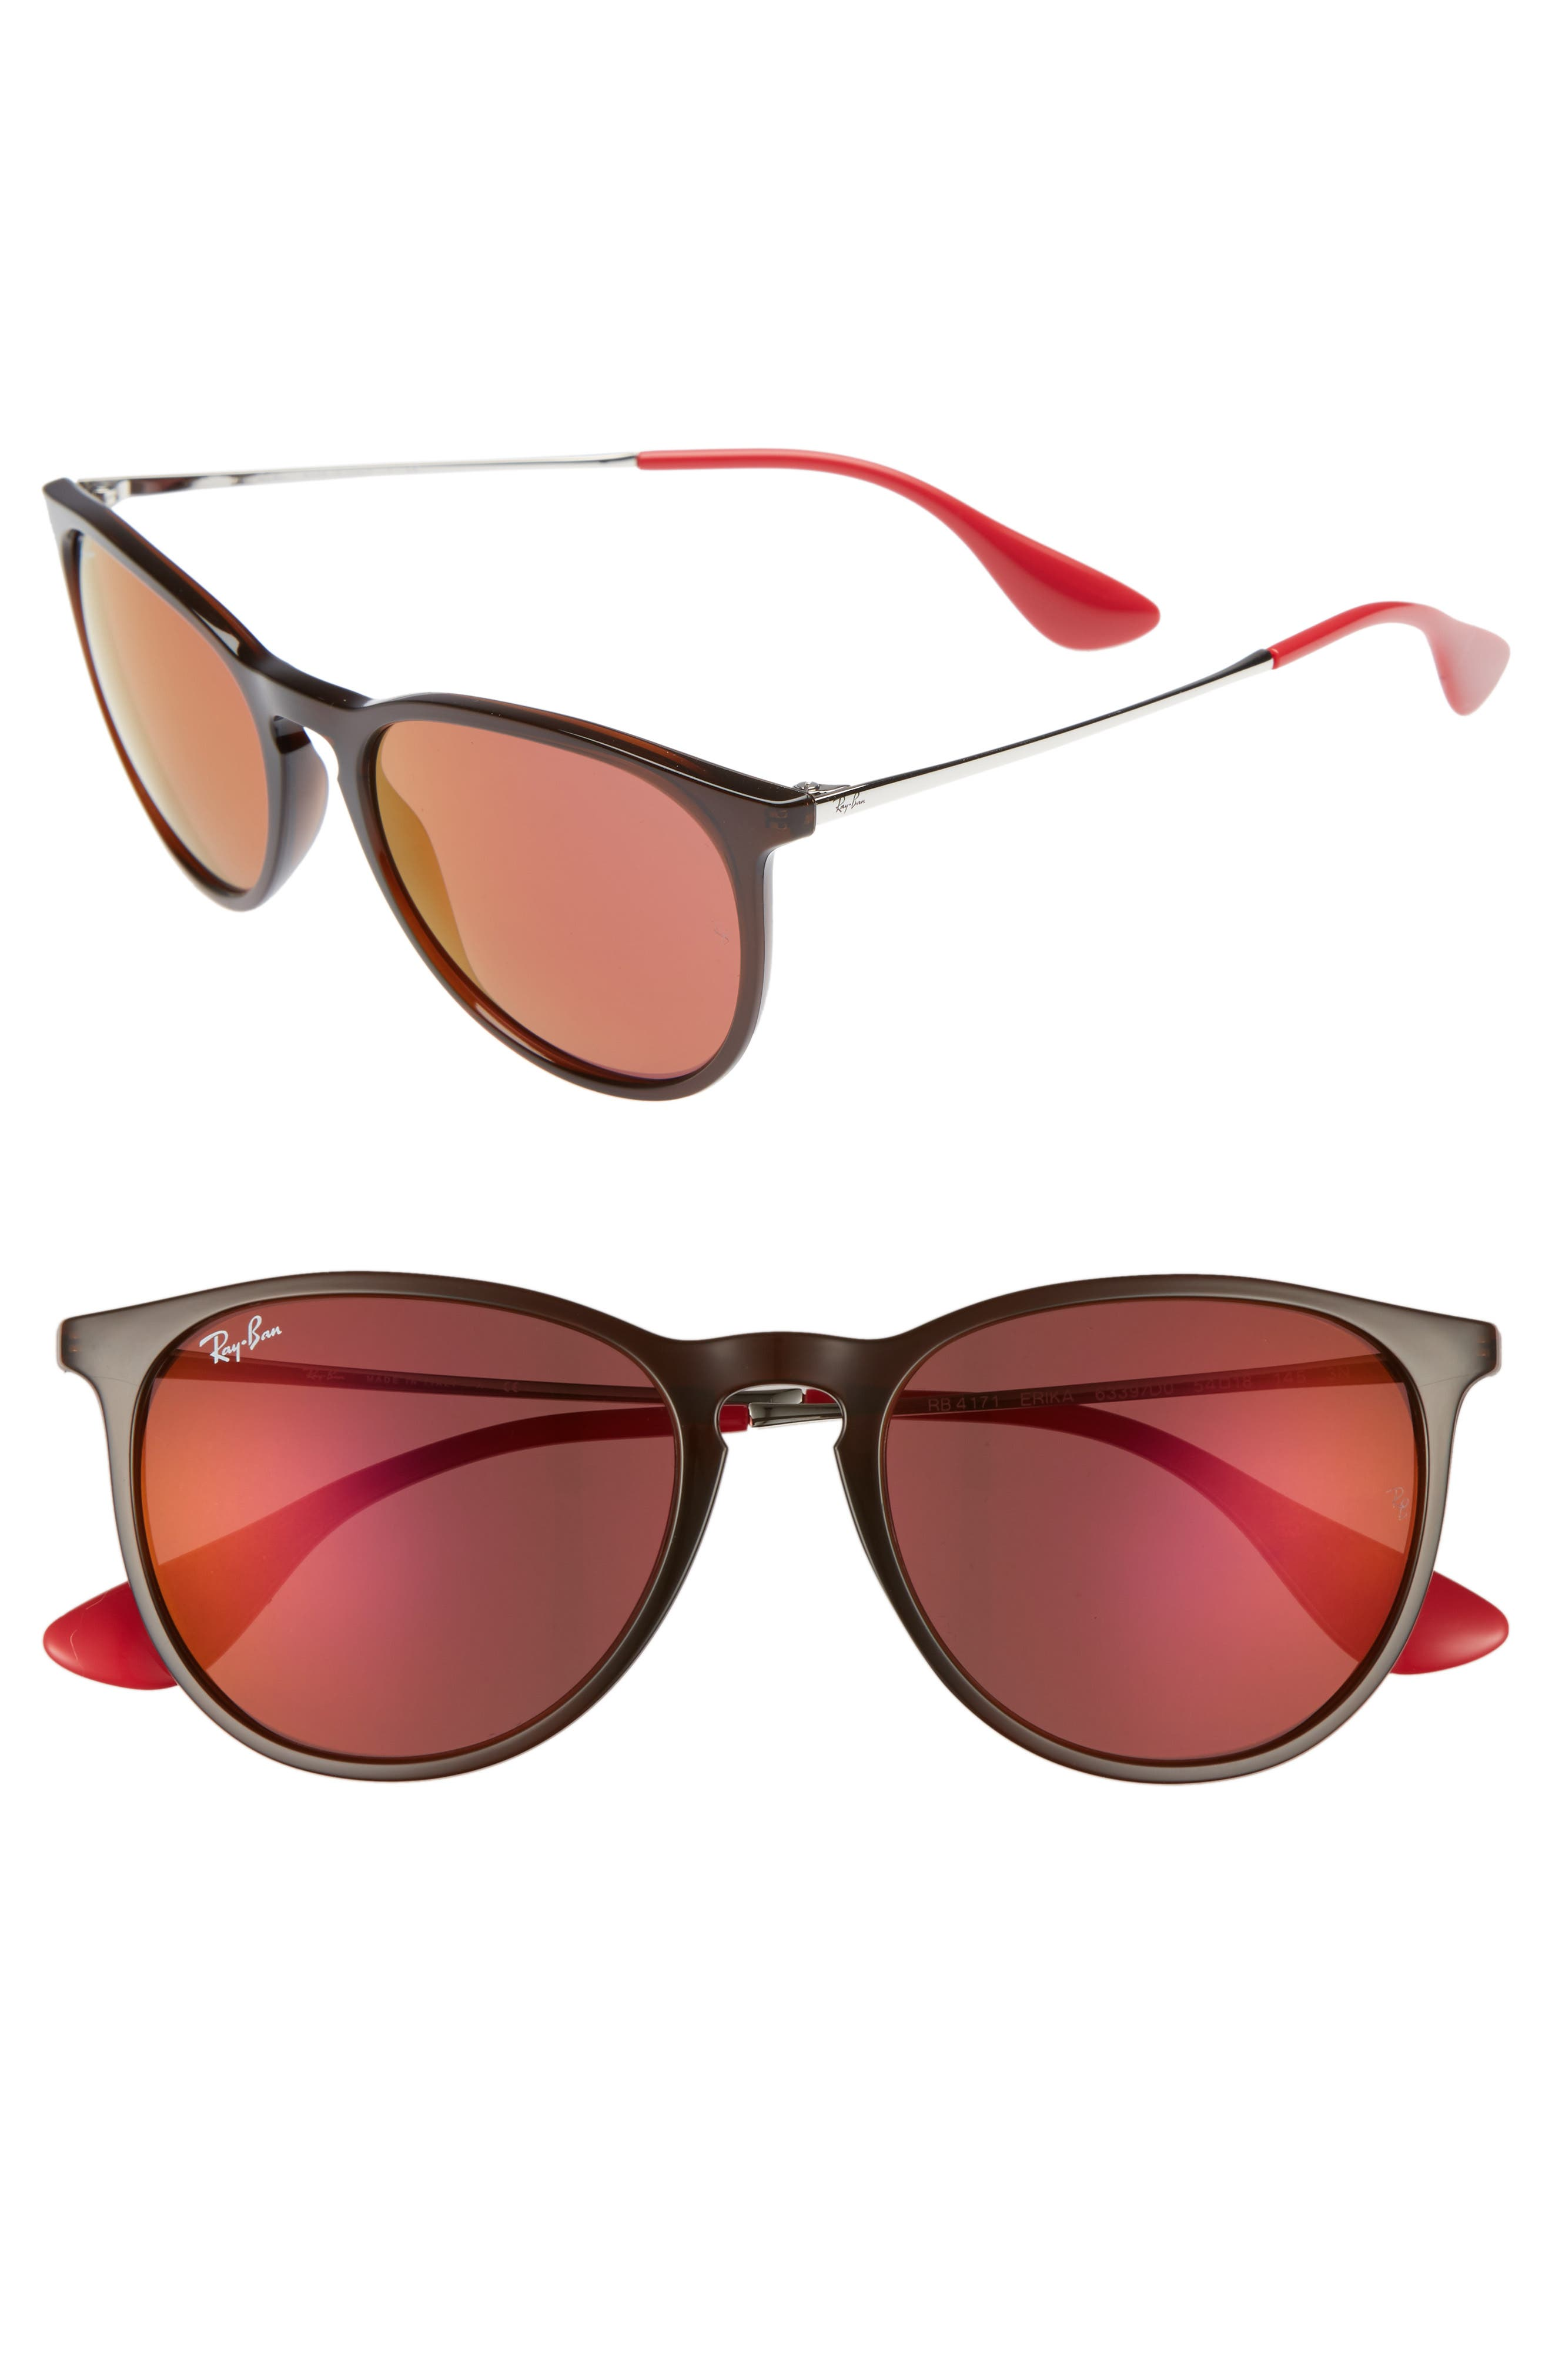 Erika Classic 54mm Sunglasses,                             Main thumbnail 1, color,                             Brown